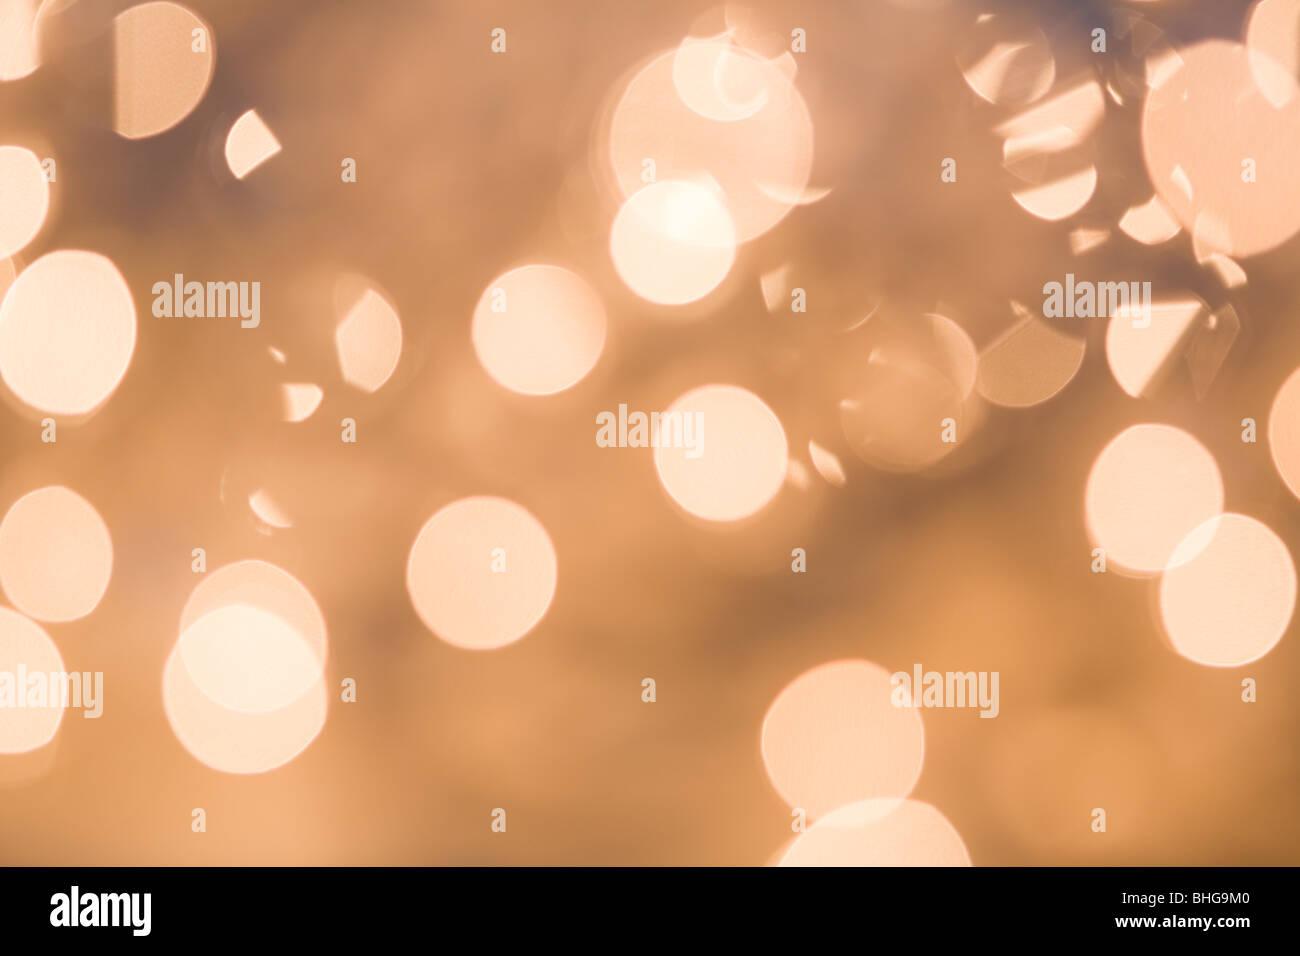 Circles of light - Stock Image